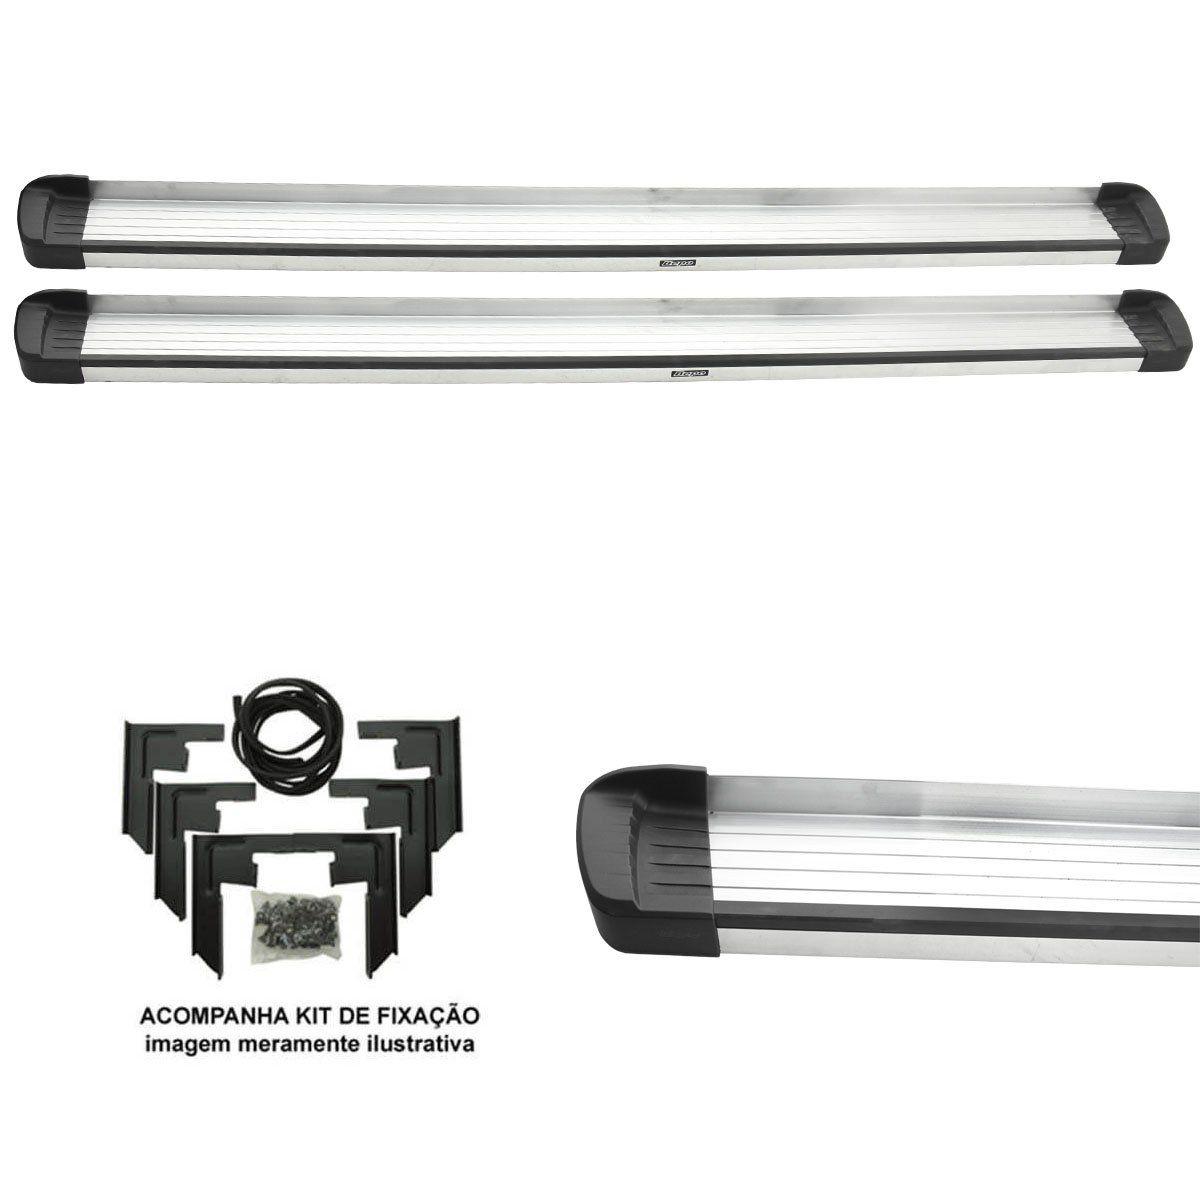 Estribo Bepo G3 alumínio Amarok cabine dupla 2011 a 2021